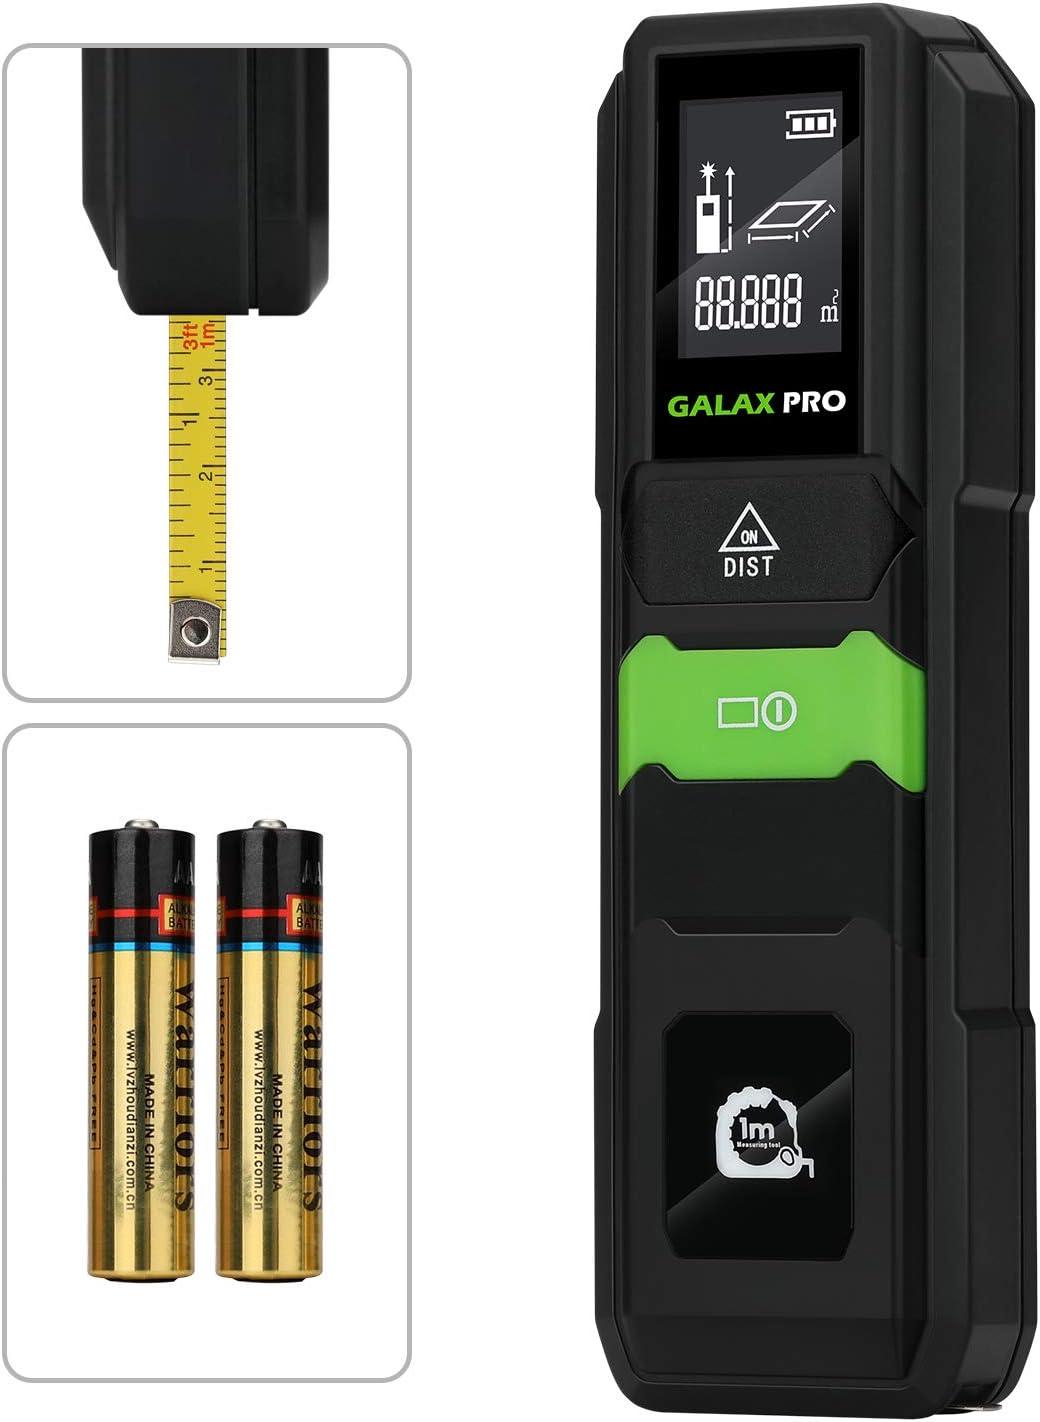 Telémetro láser 40m, GALAX PRO Medidor Láser, Precisión ±2 mm, LCD Retroiluminación, Medición de distancia, Área,Batería Incluida/MKL-C02